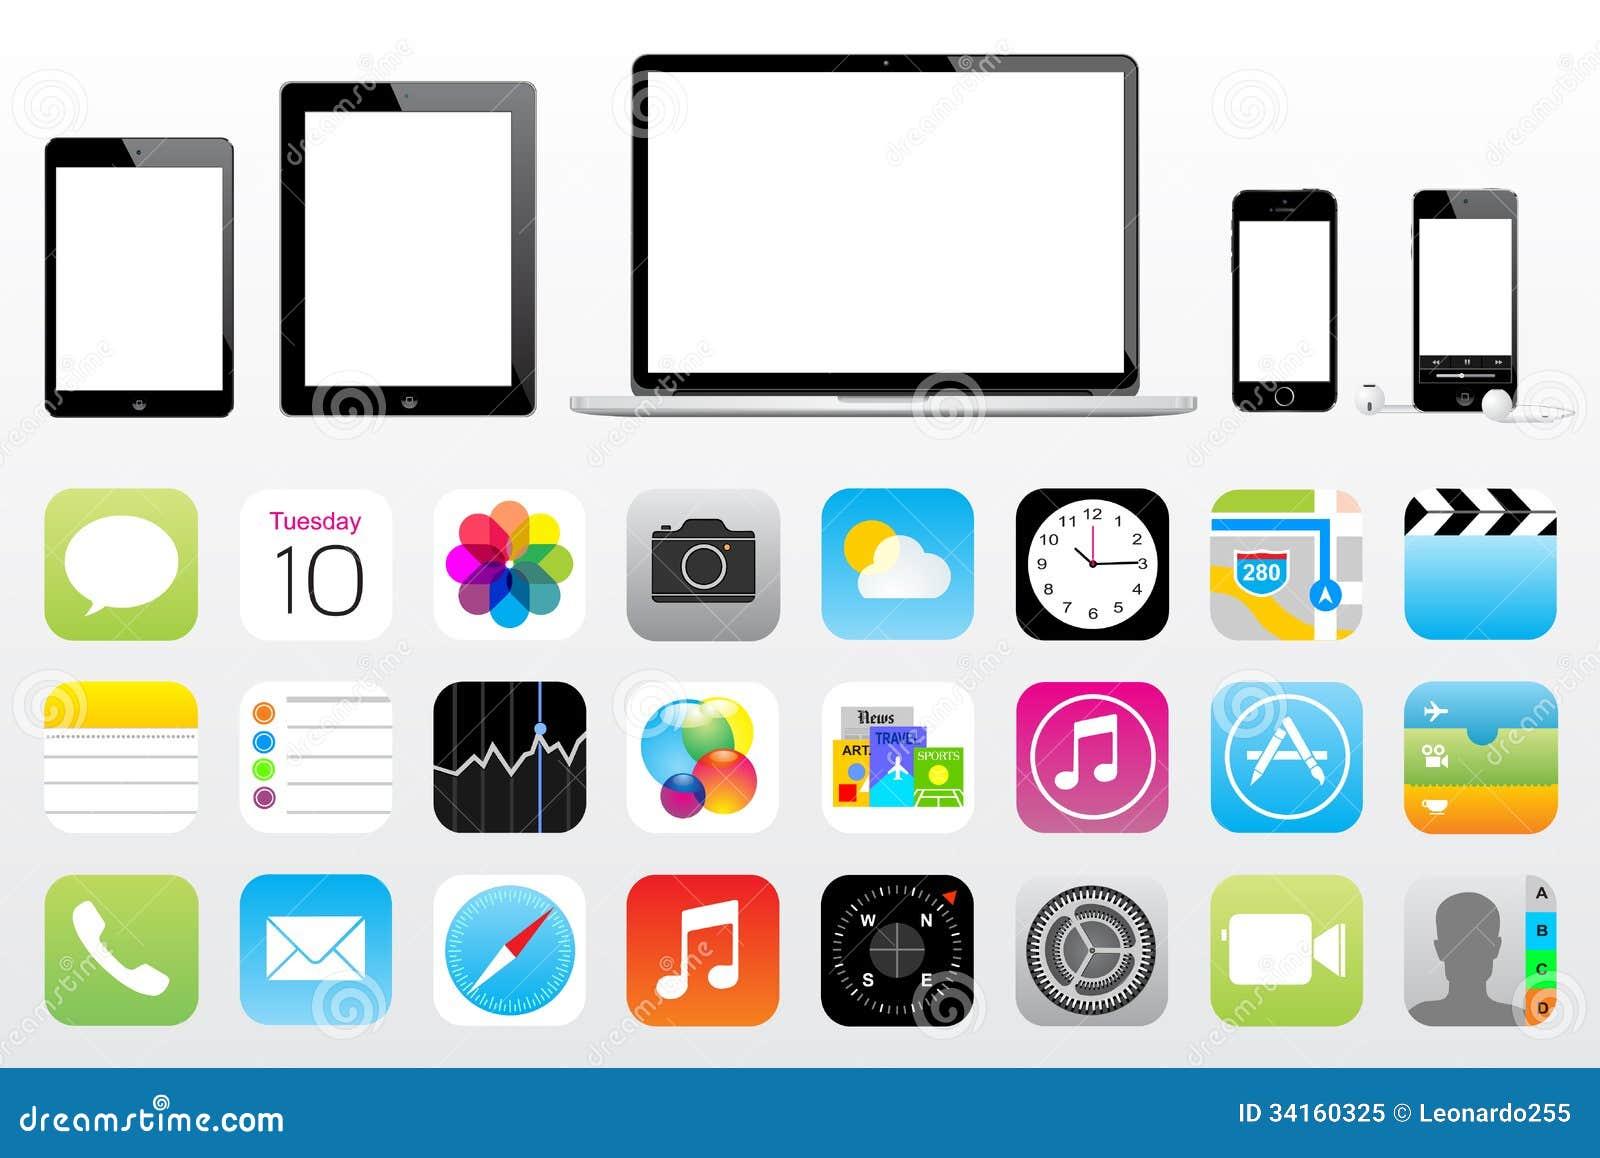 ic ne d 39 imper d 39 ipod d 39 iphone d 39 ipad d 39 apple mini image ditorial illustration du graphisme. Black Bedroom Furniture Sets. Home Design Ideas